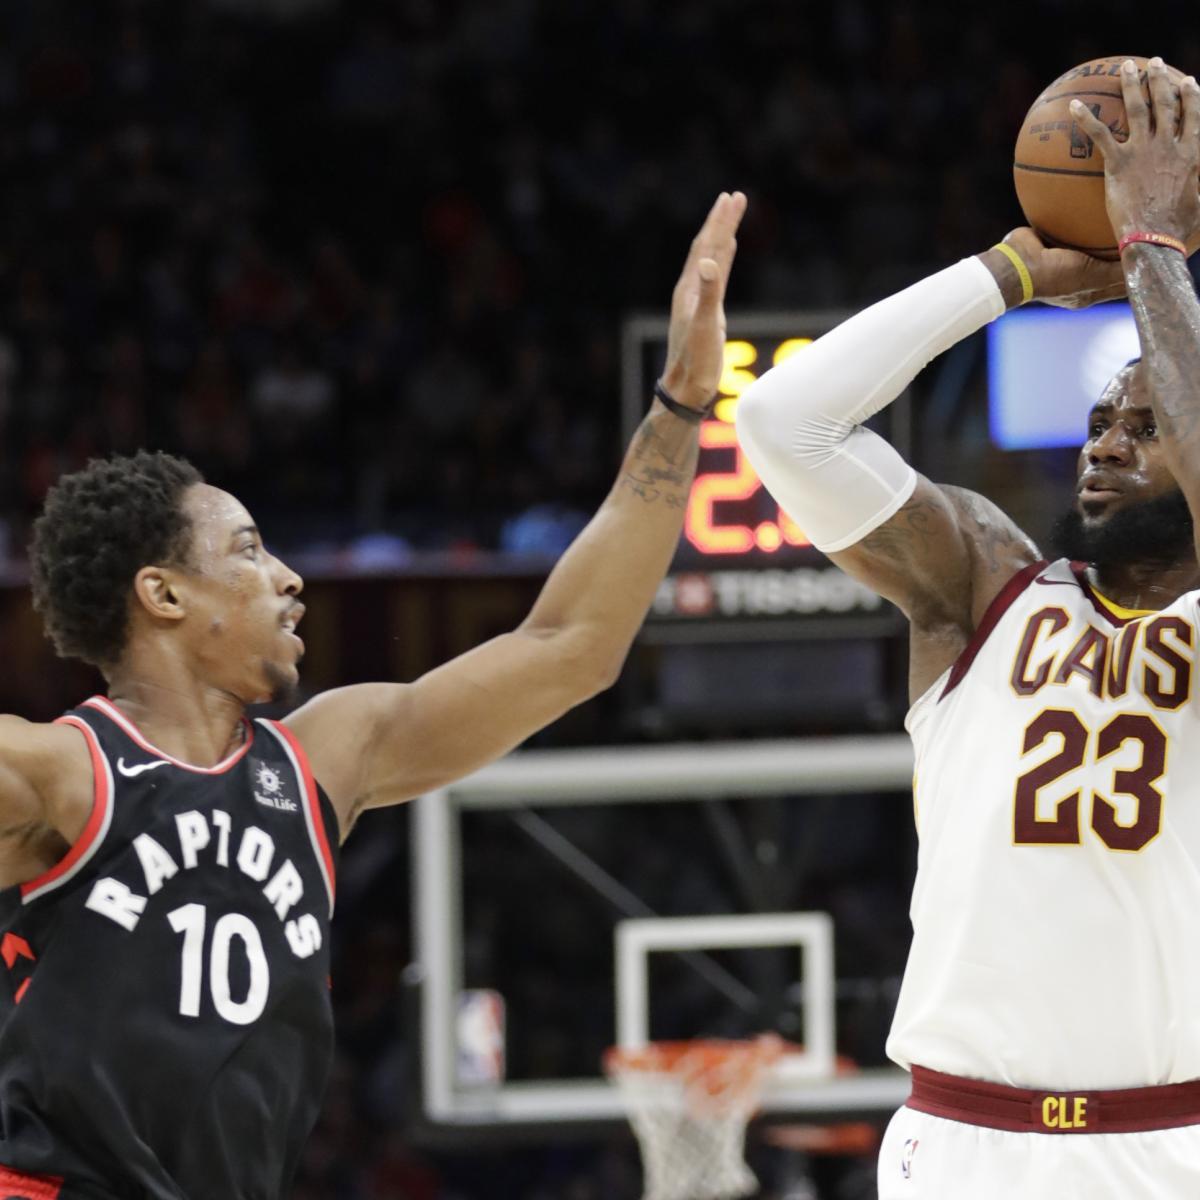 DeMar DeRozan: LeBron Told Raptors Player How to Run Toronto Play in 2016 Series